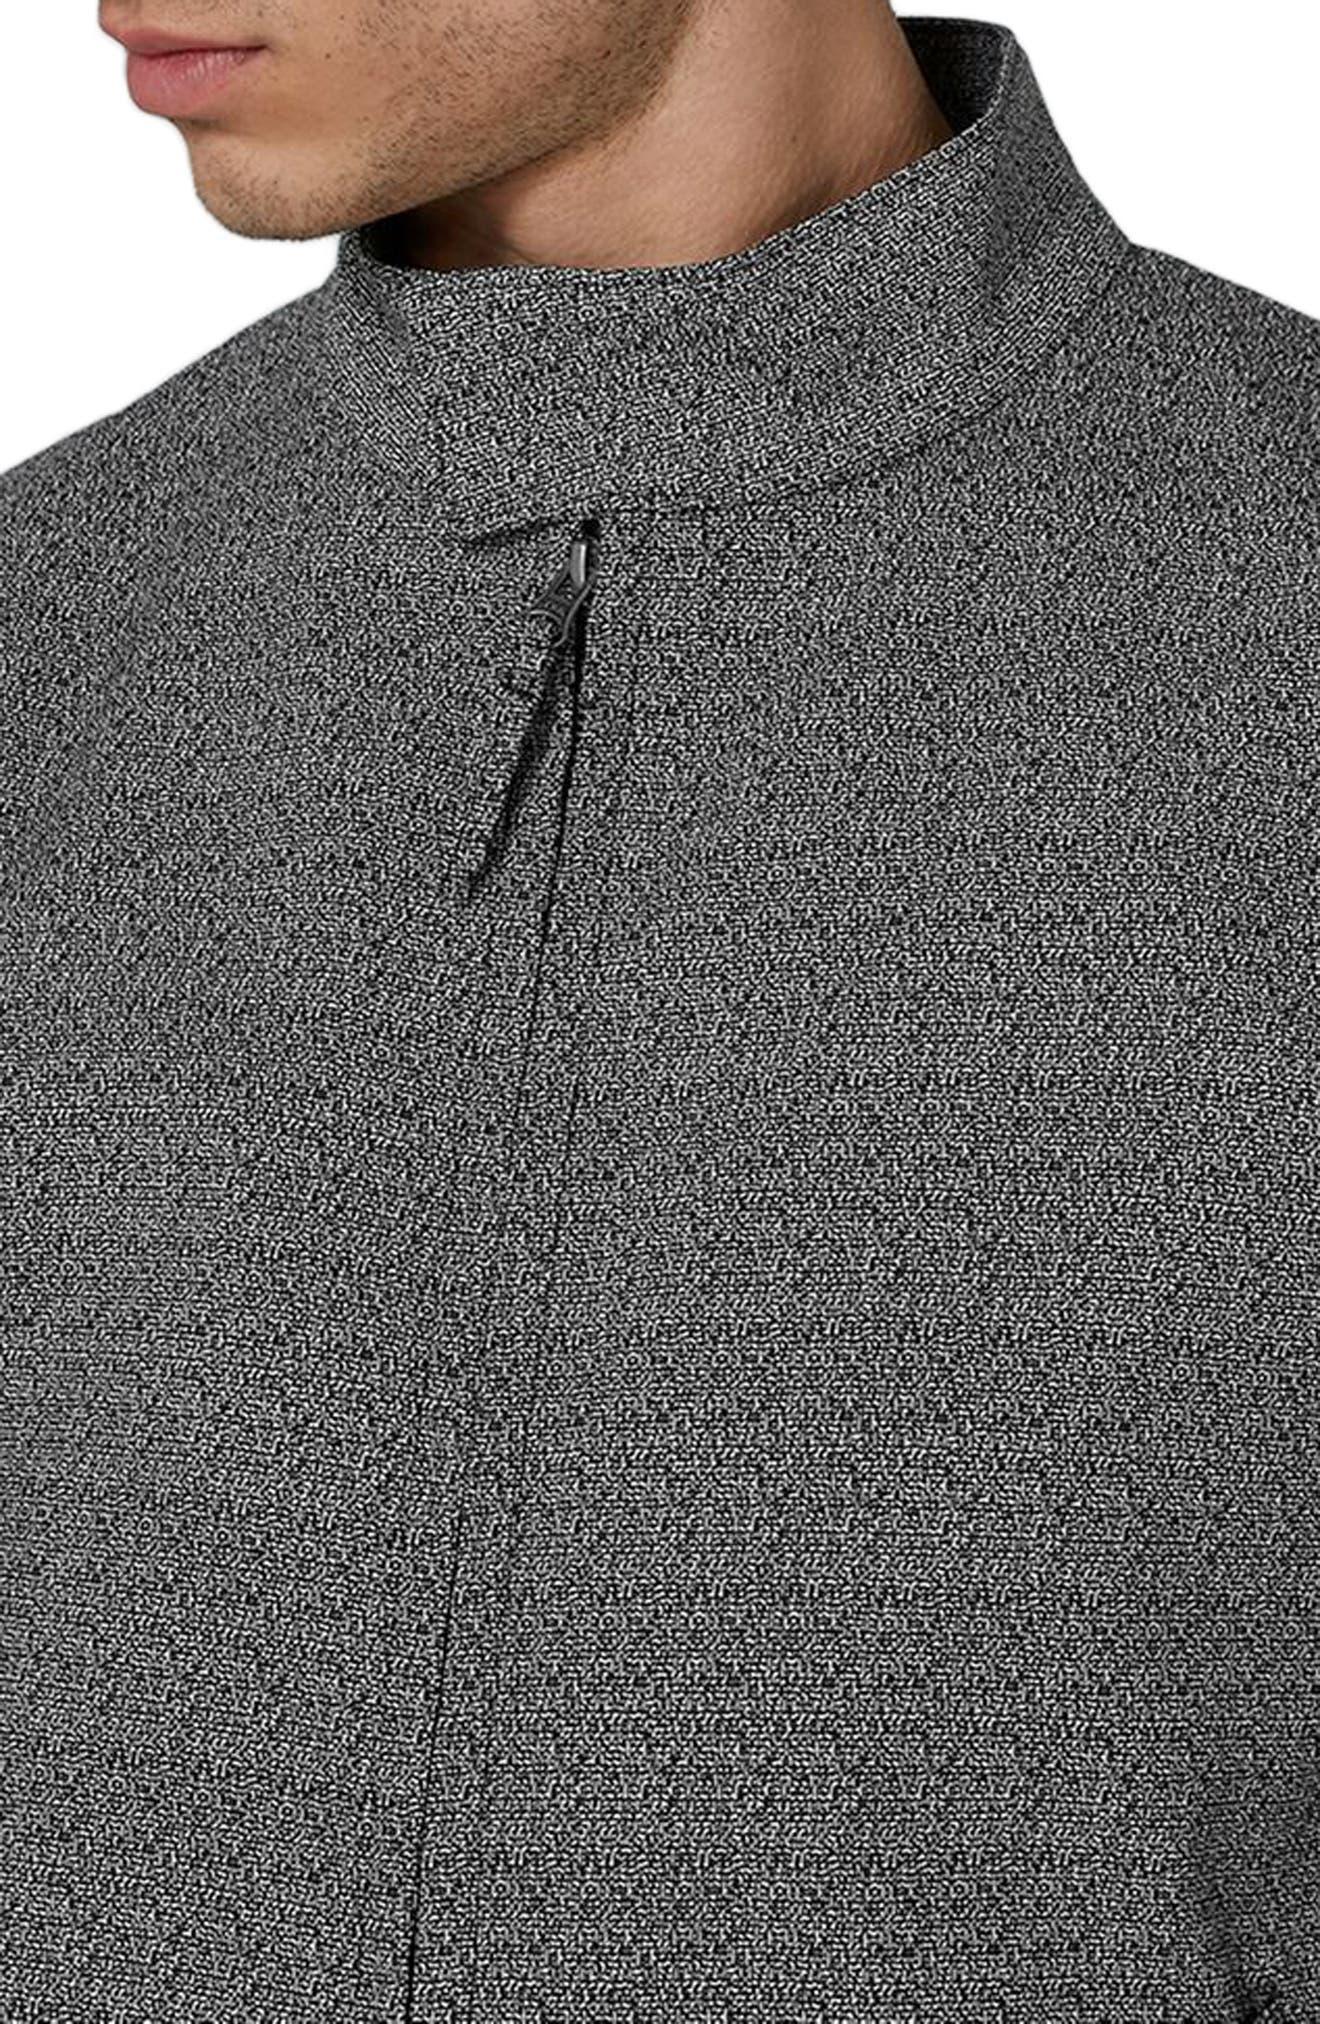 Textured Harrington Jacket,                             Alternate thumbnail 3, color,                             021